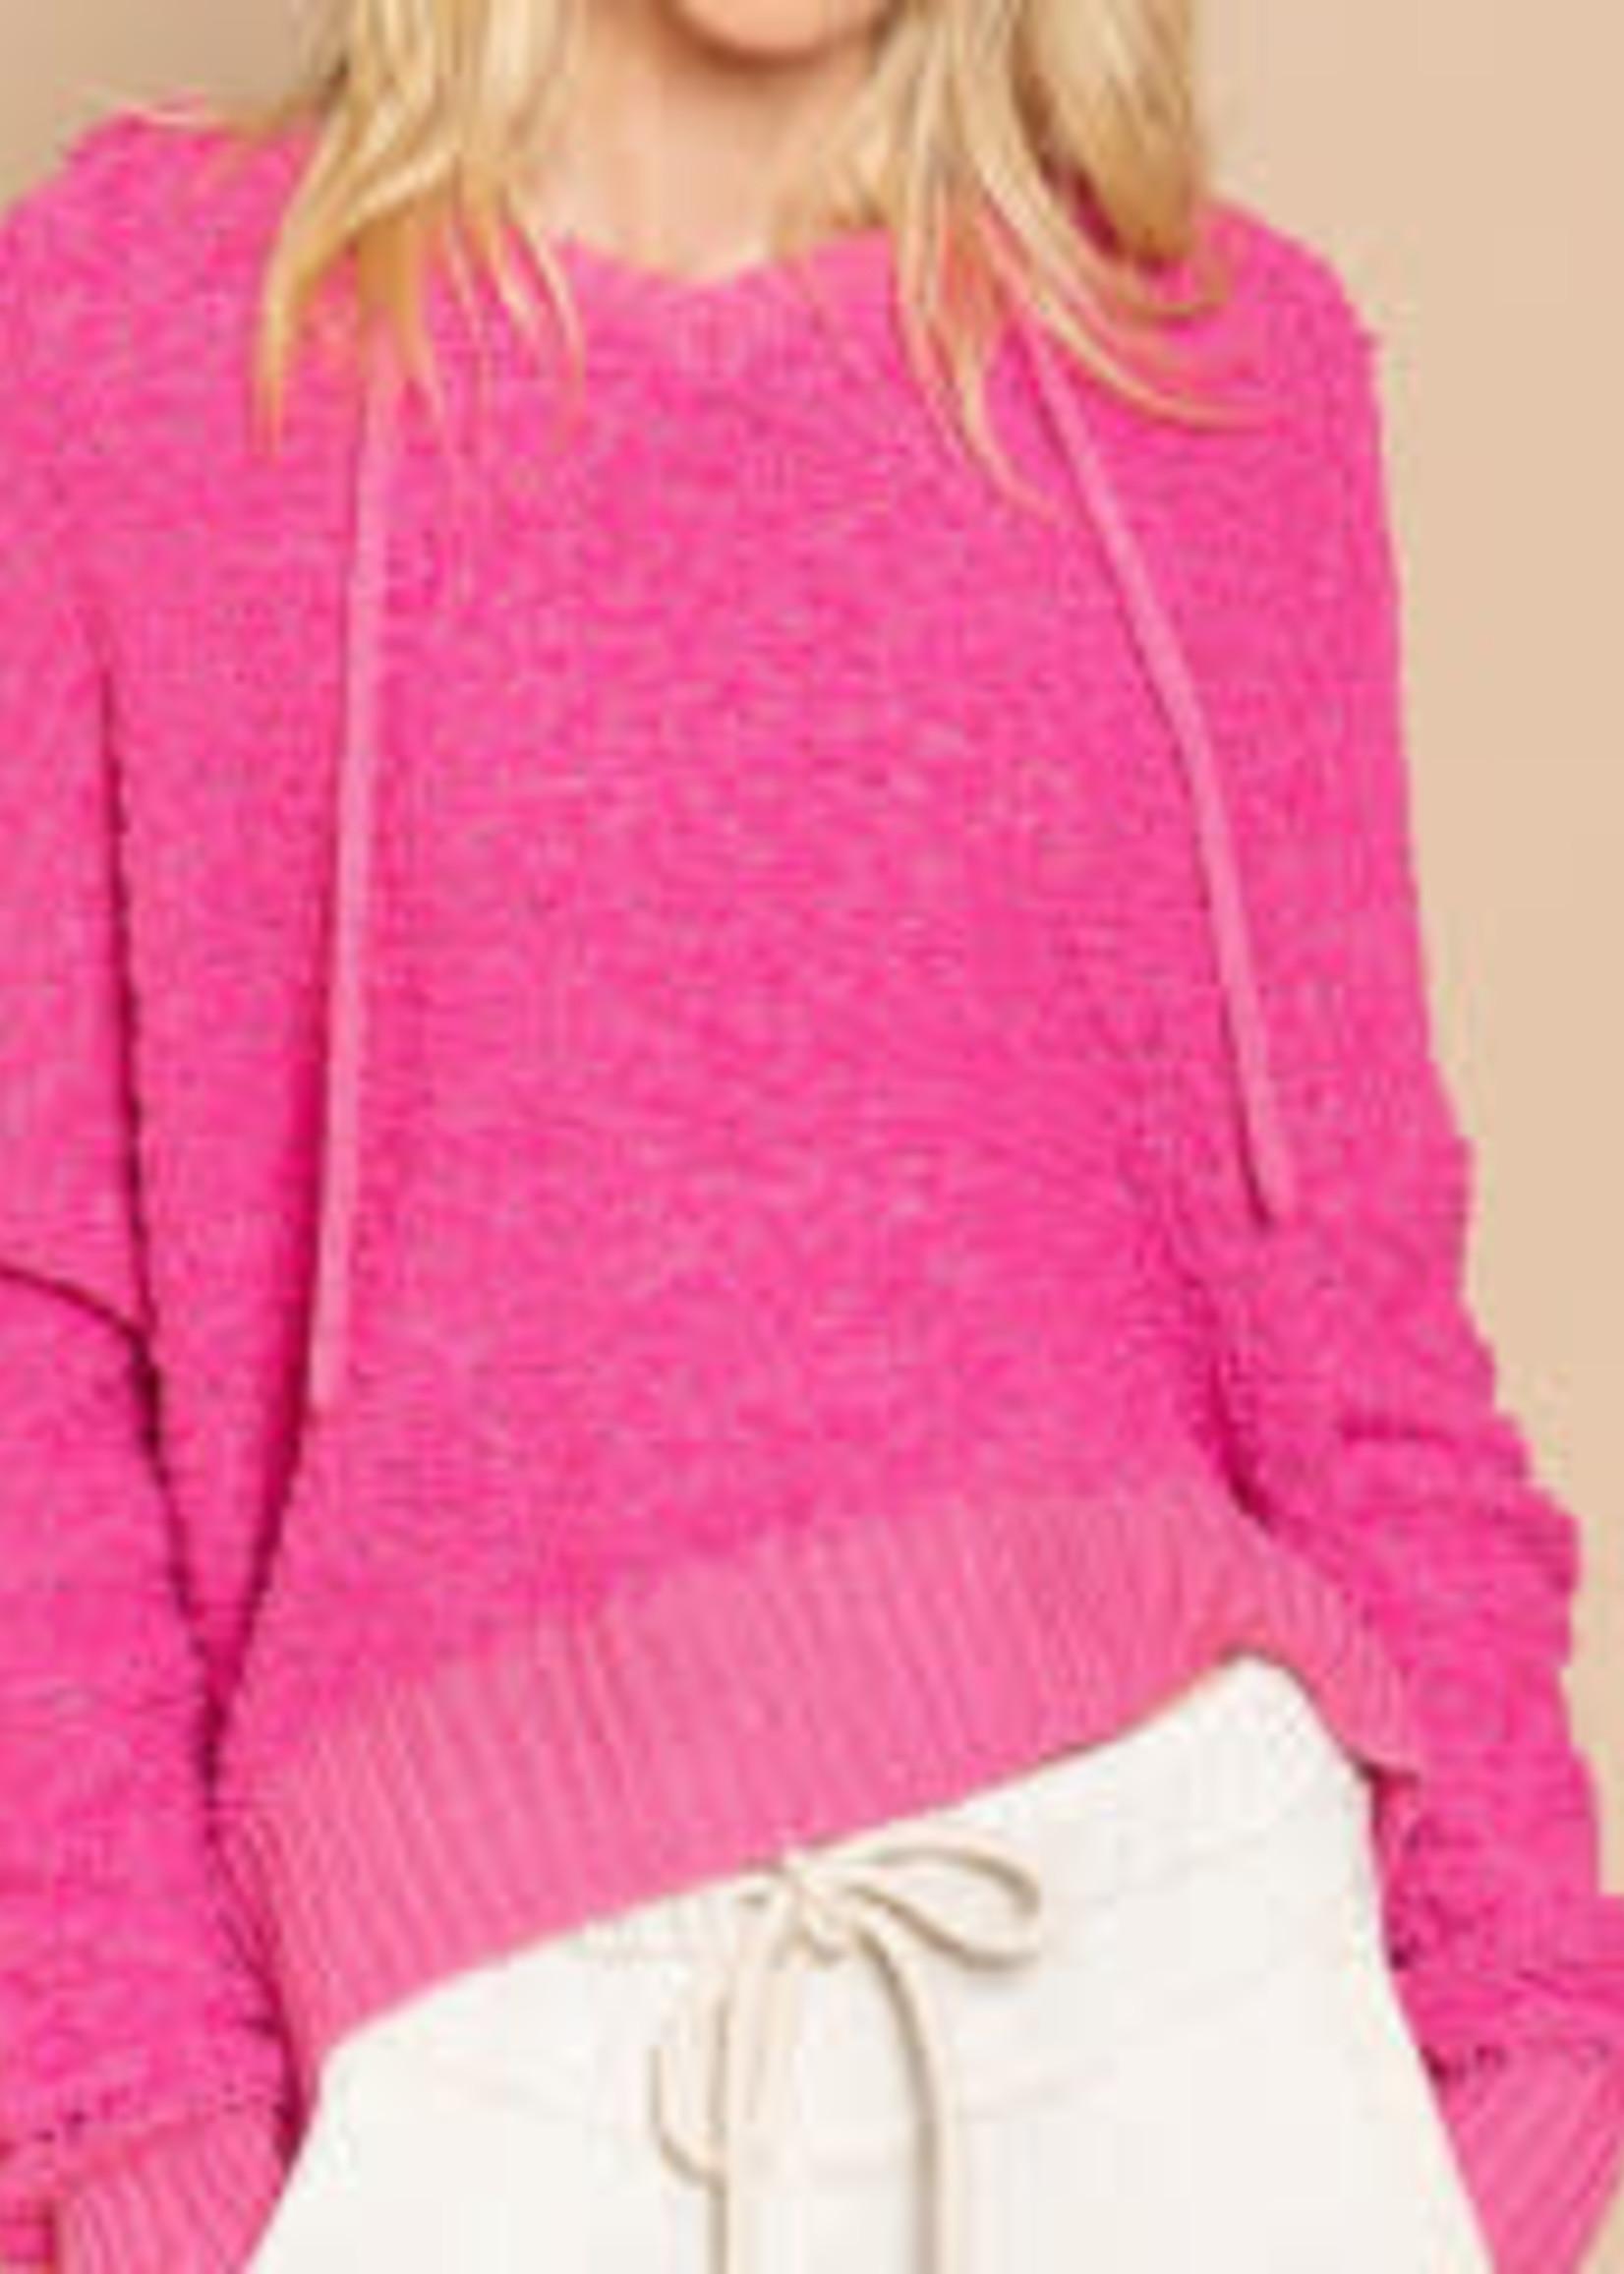 Popcorn Texture Hoodie , Hot Pink, Medium